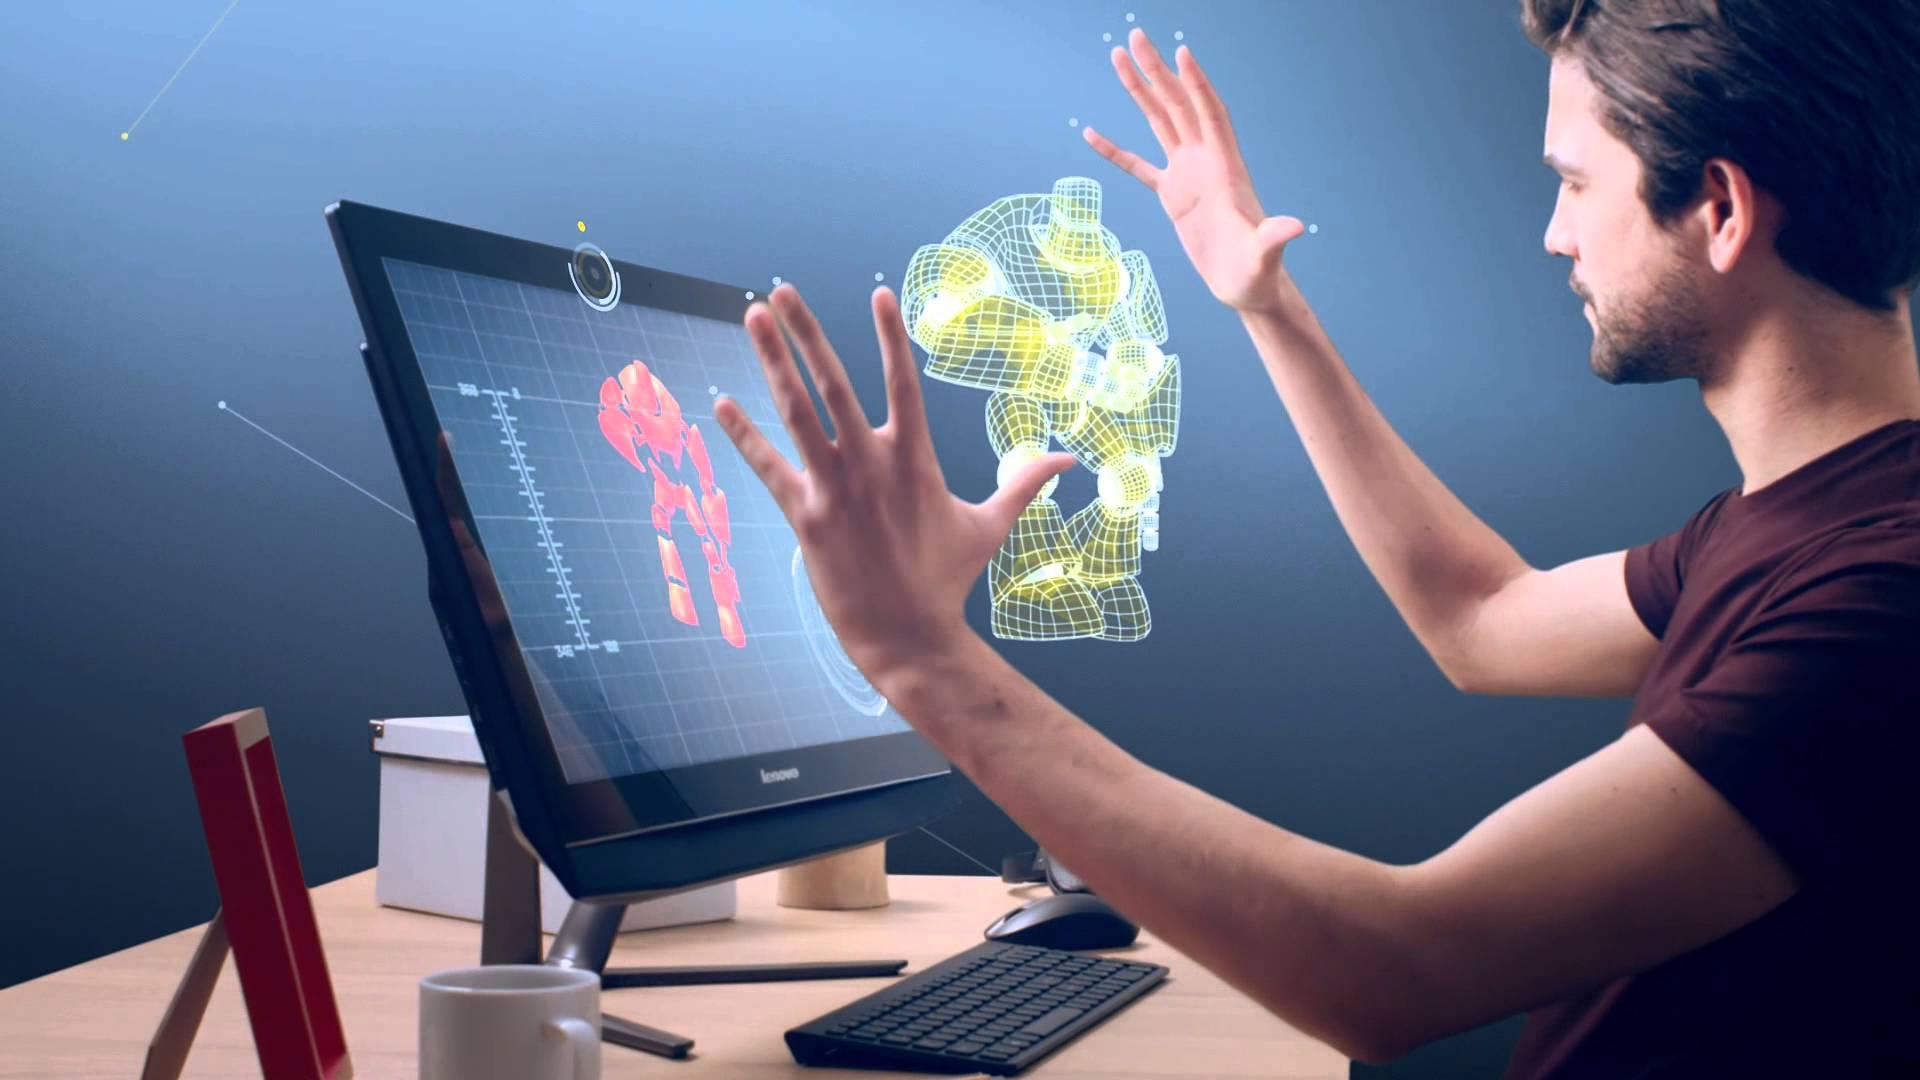 Computer graphics and animation